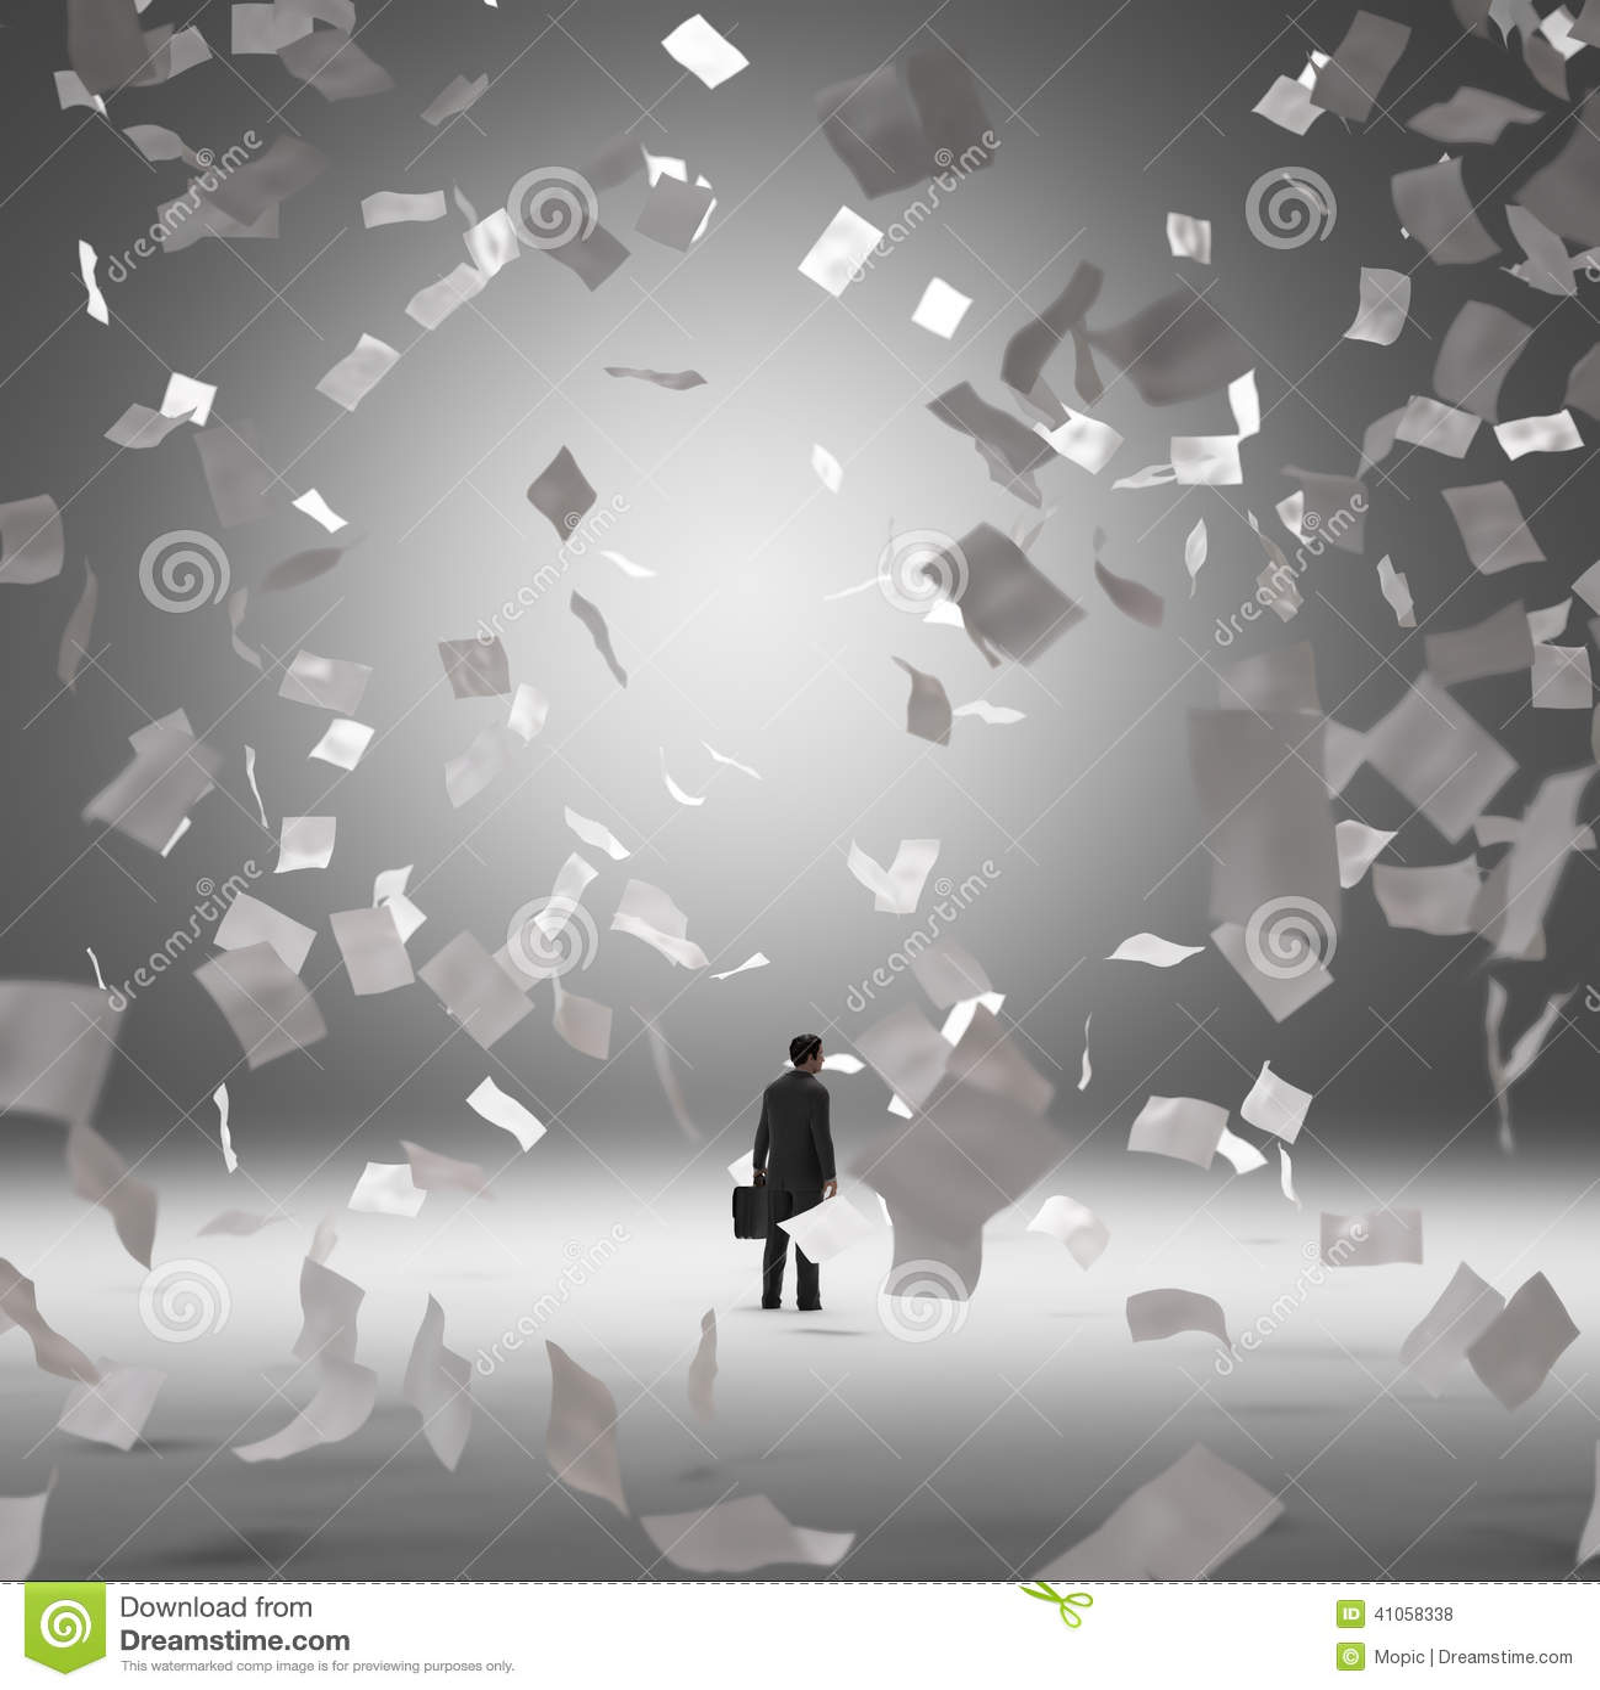 Lifestyle research paper proposal sample apa